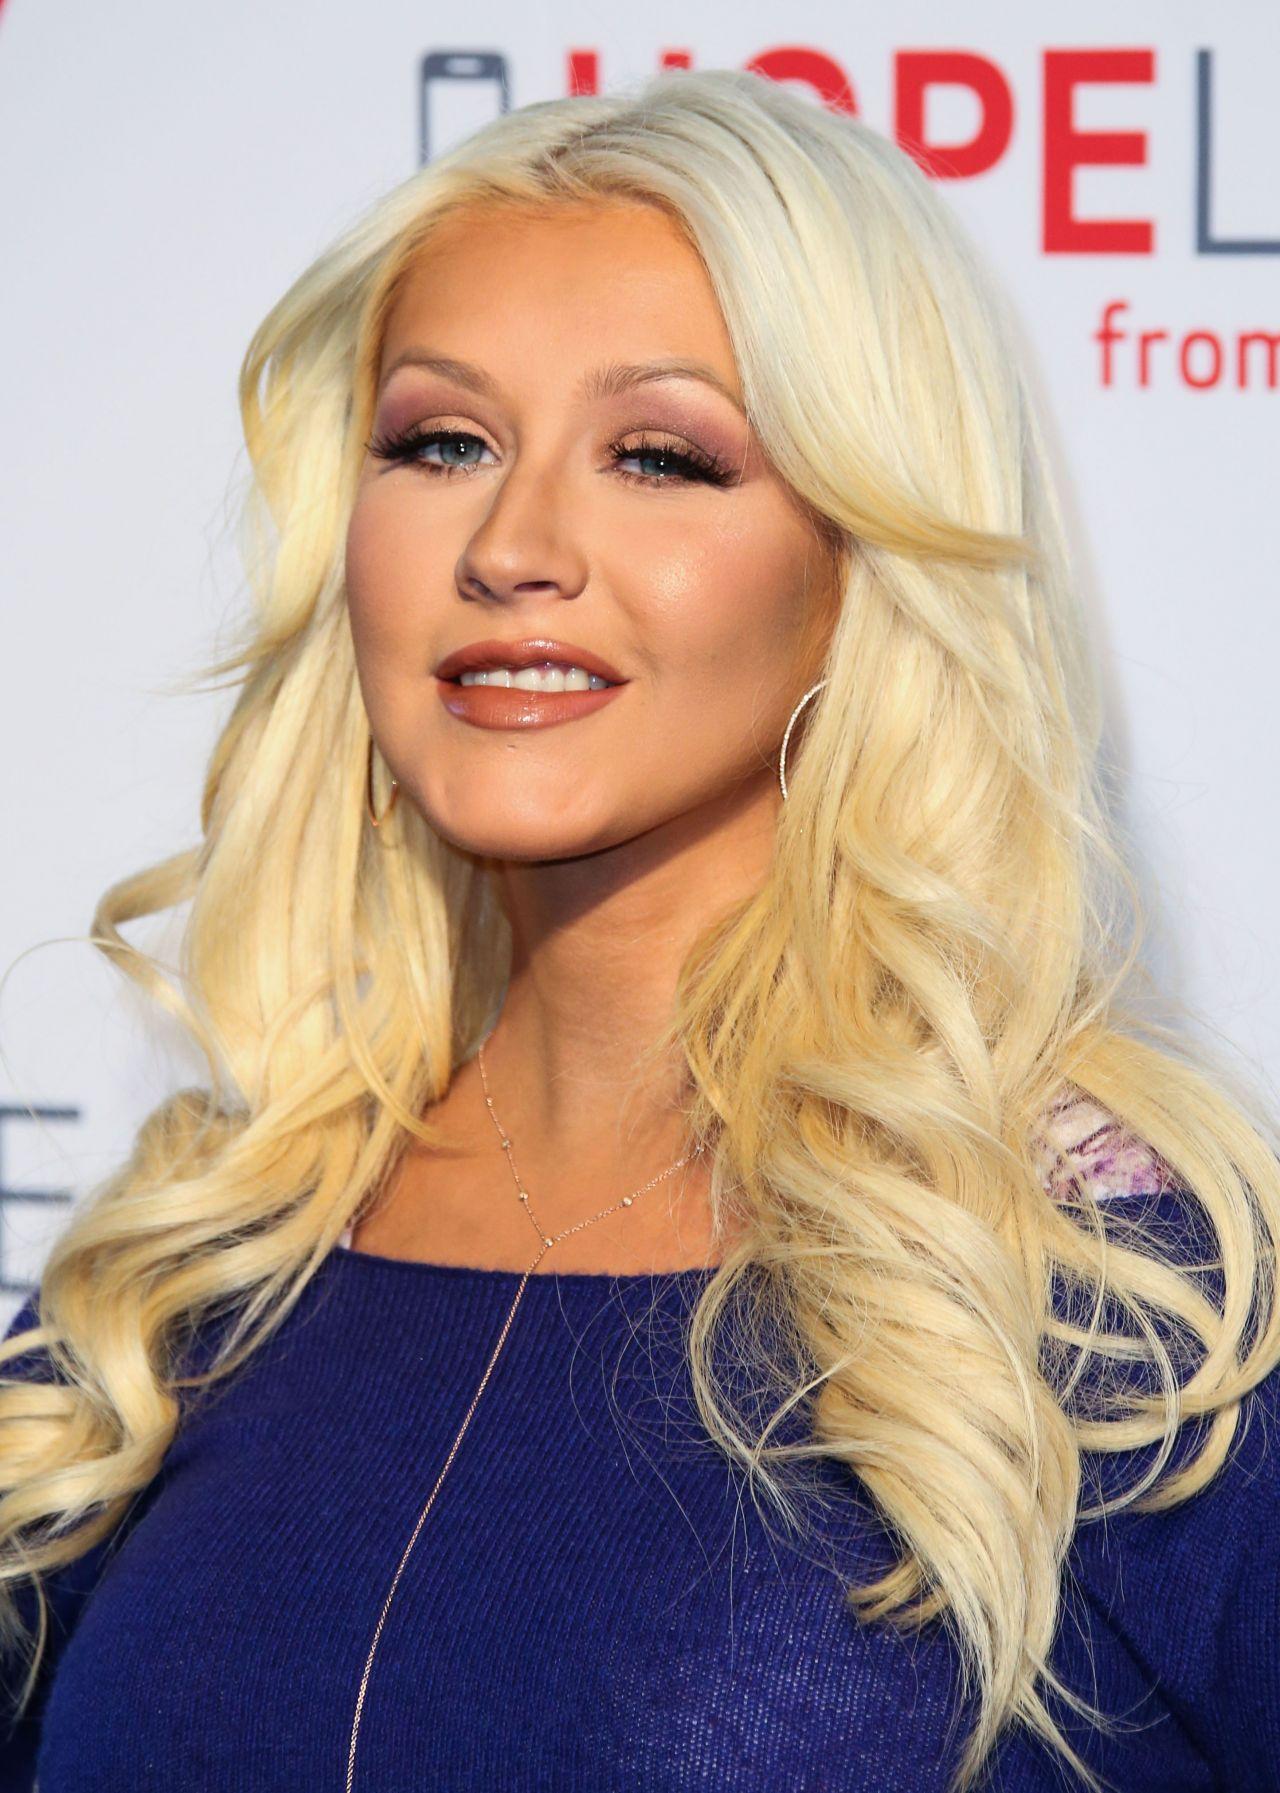 Christina Aguilera - Verizon's HopeLine Program in West ... Christina Aguilera